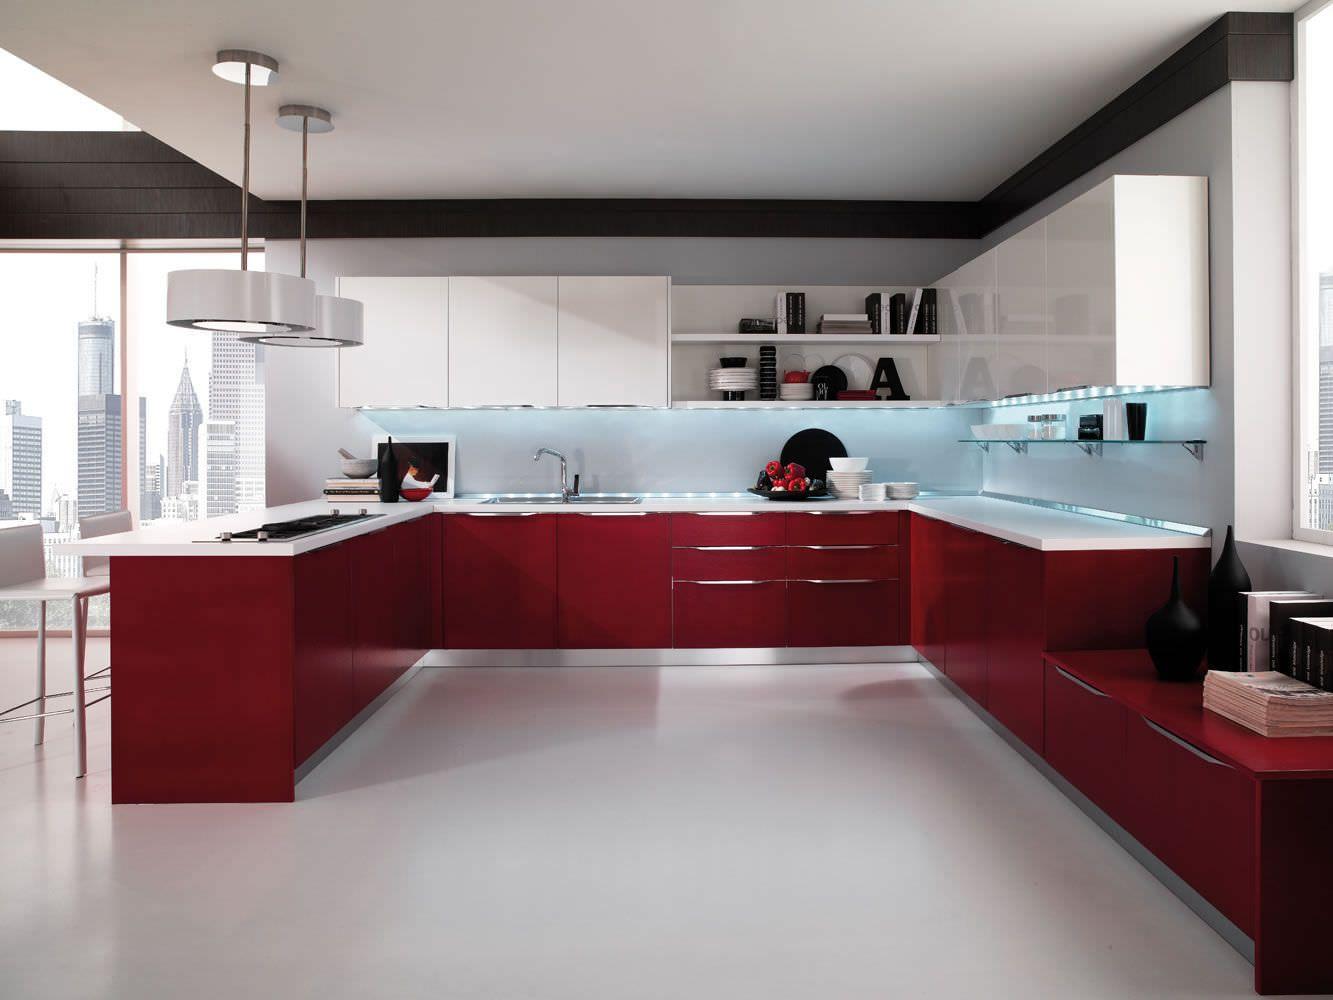 High gloss kitchens contemporary kitchen lacquered high gloss airone torchetti cucine ipc427 - high  gloss KVUGKQV